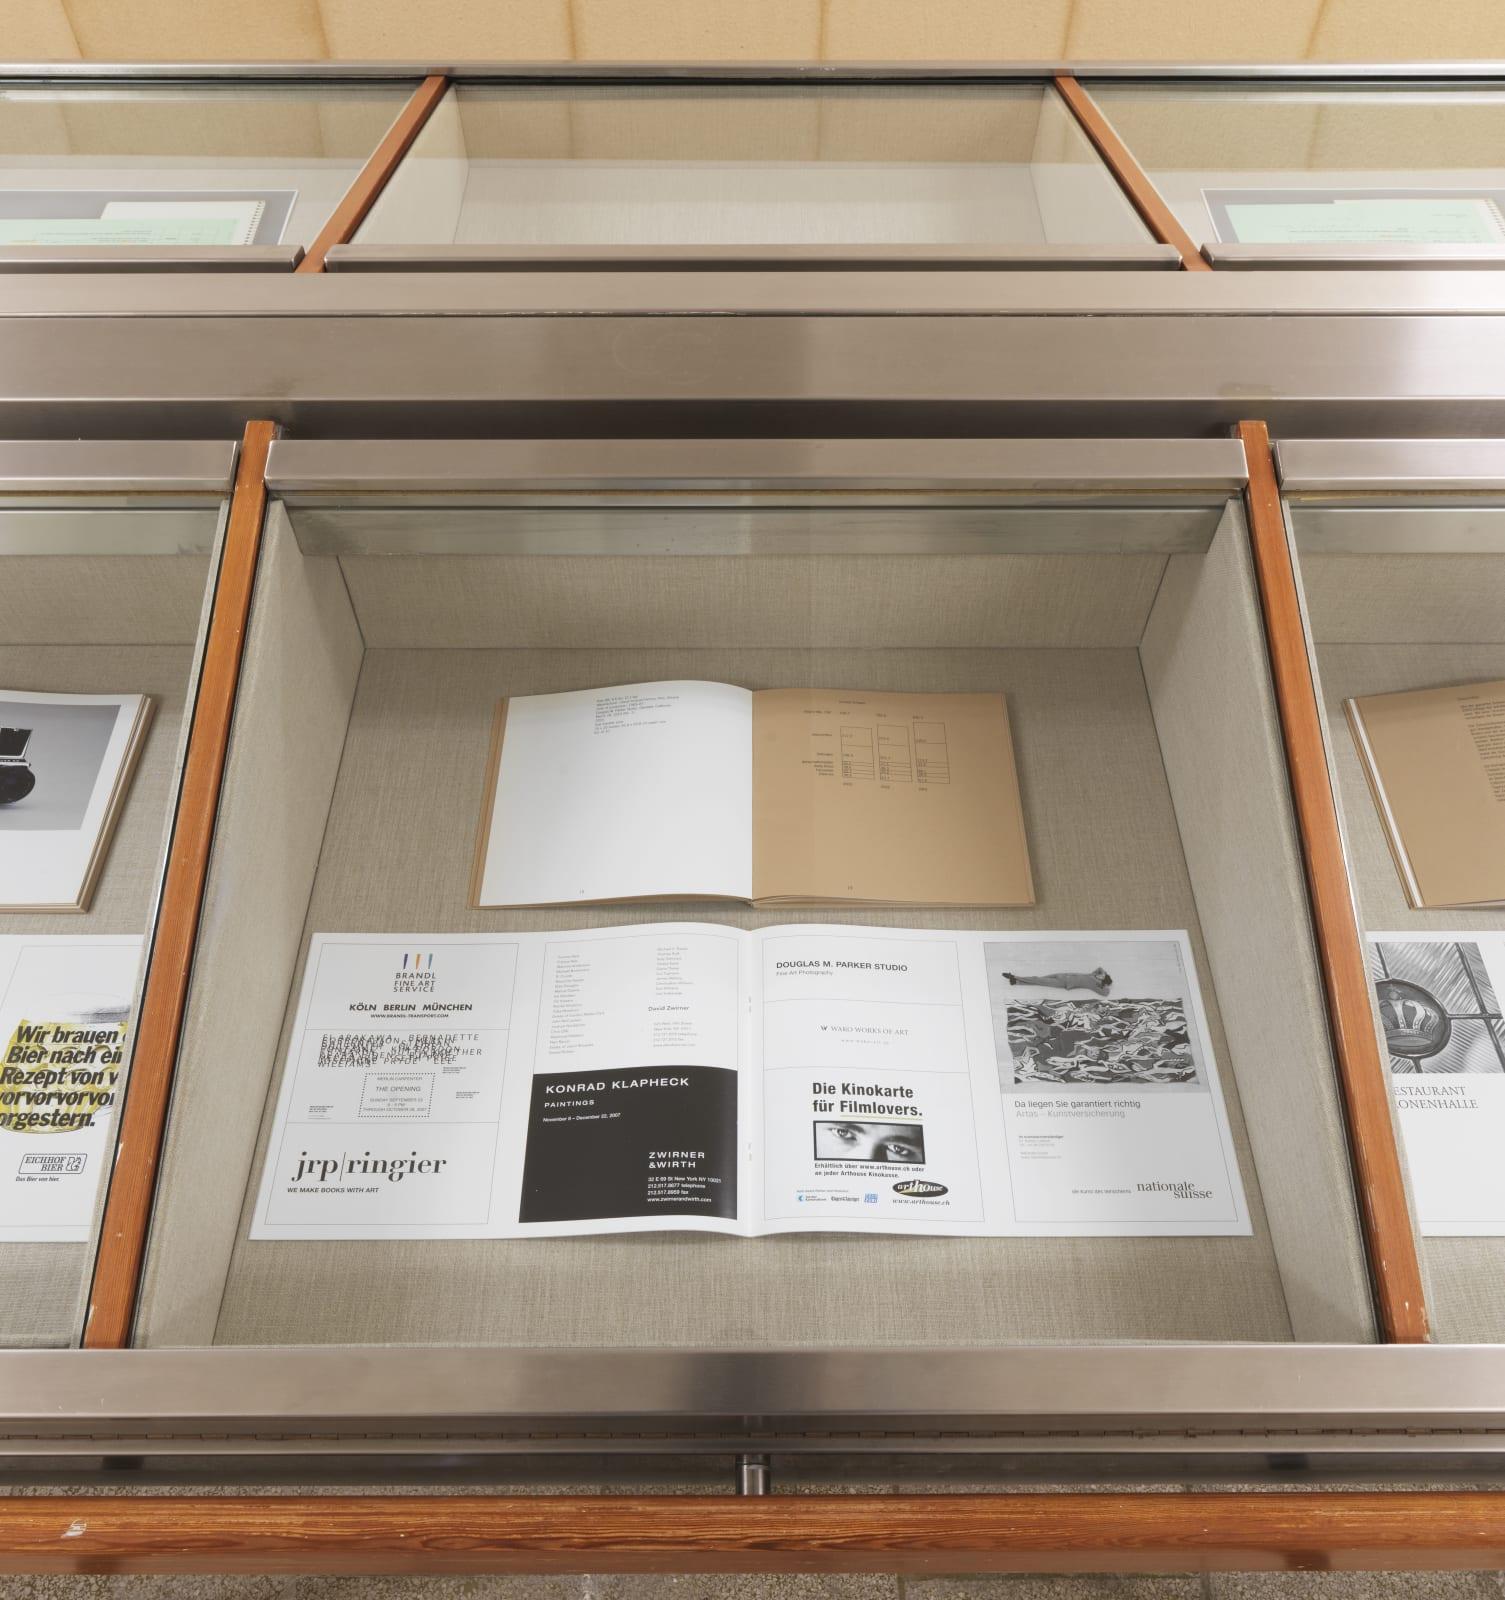 Installation view: Souterrain, Christopher Williams, Kochgeschirr (Adapted for Use), Capitain Petzel, Berlin, 2021 Ph: Jens Ziehe